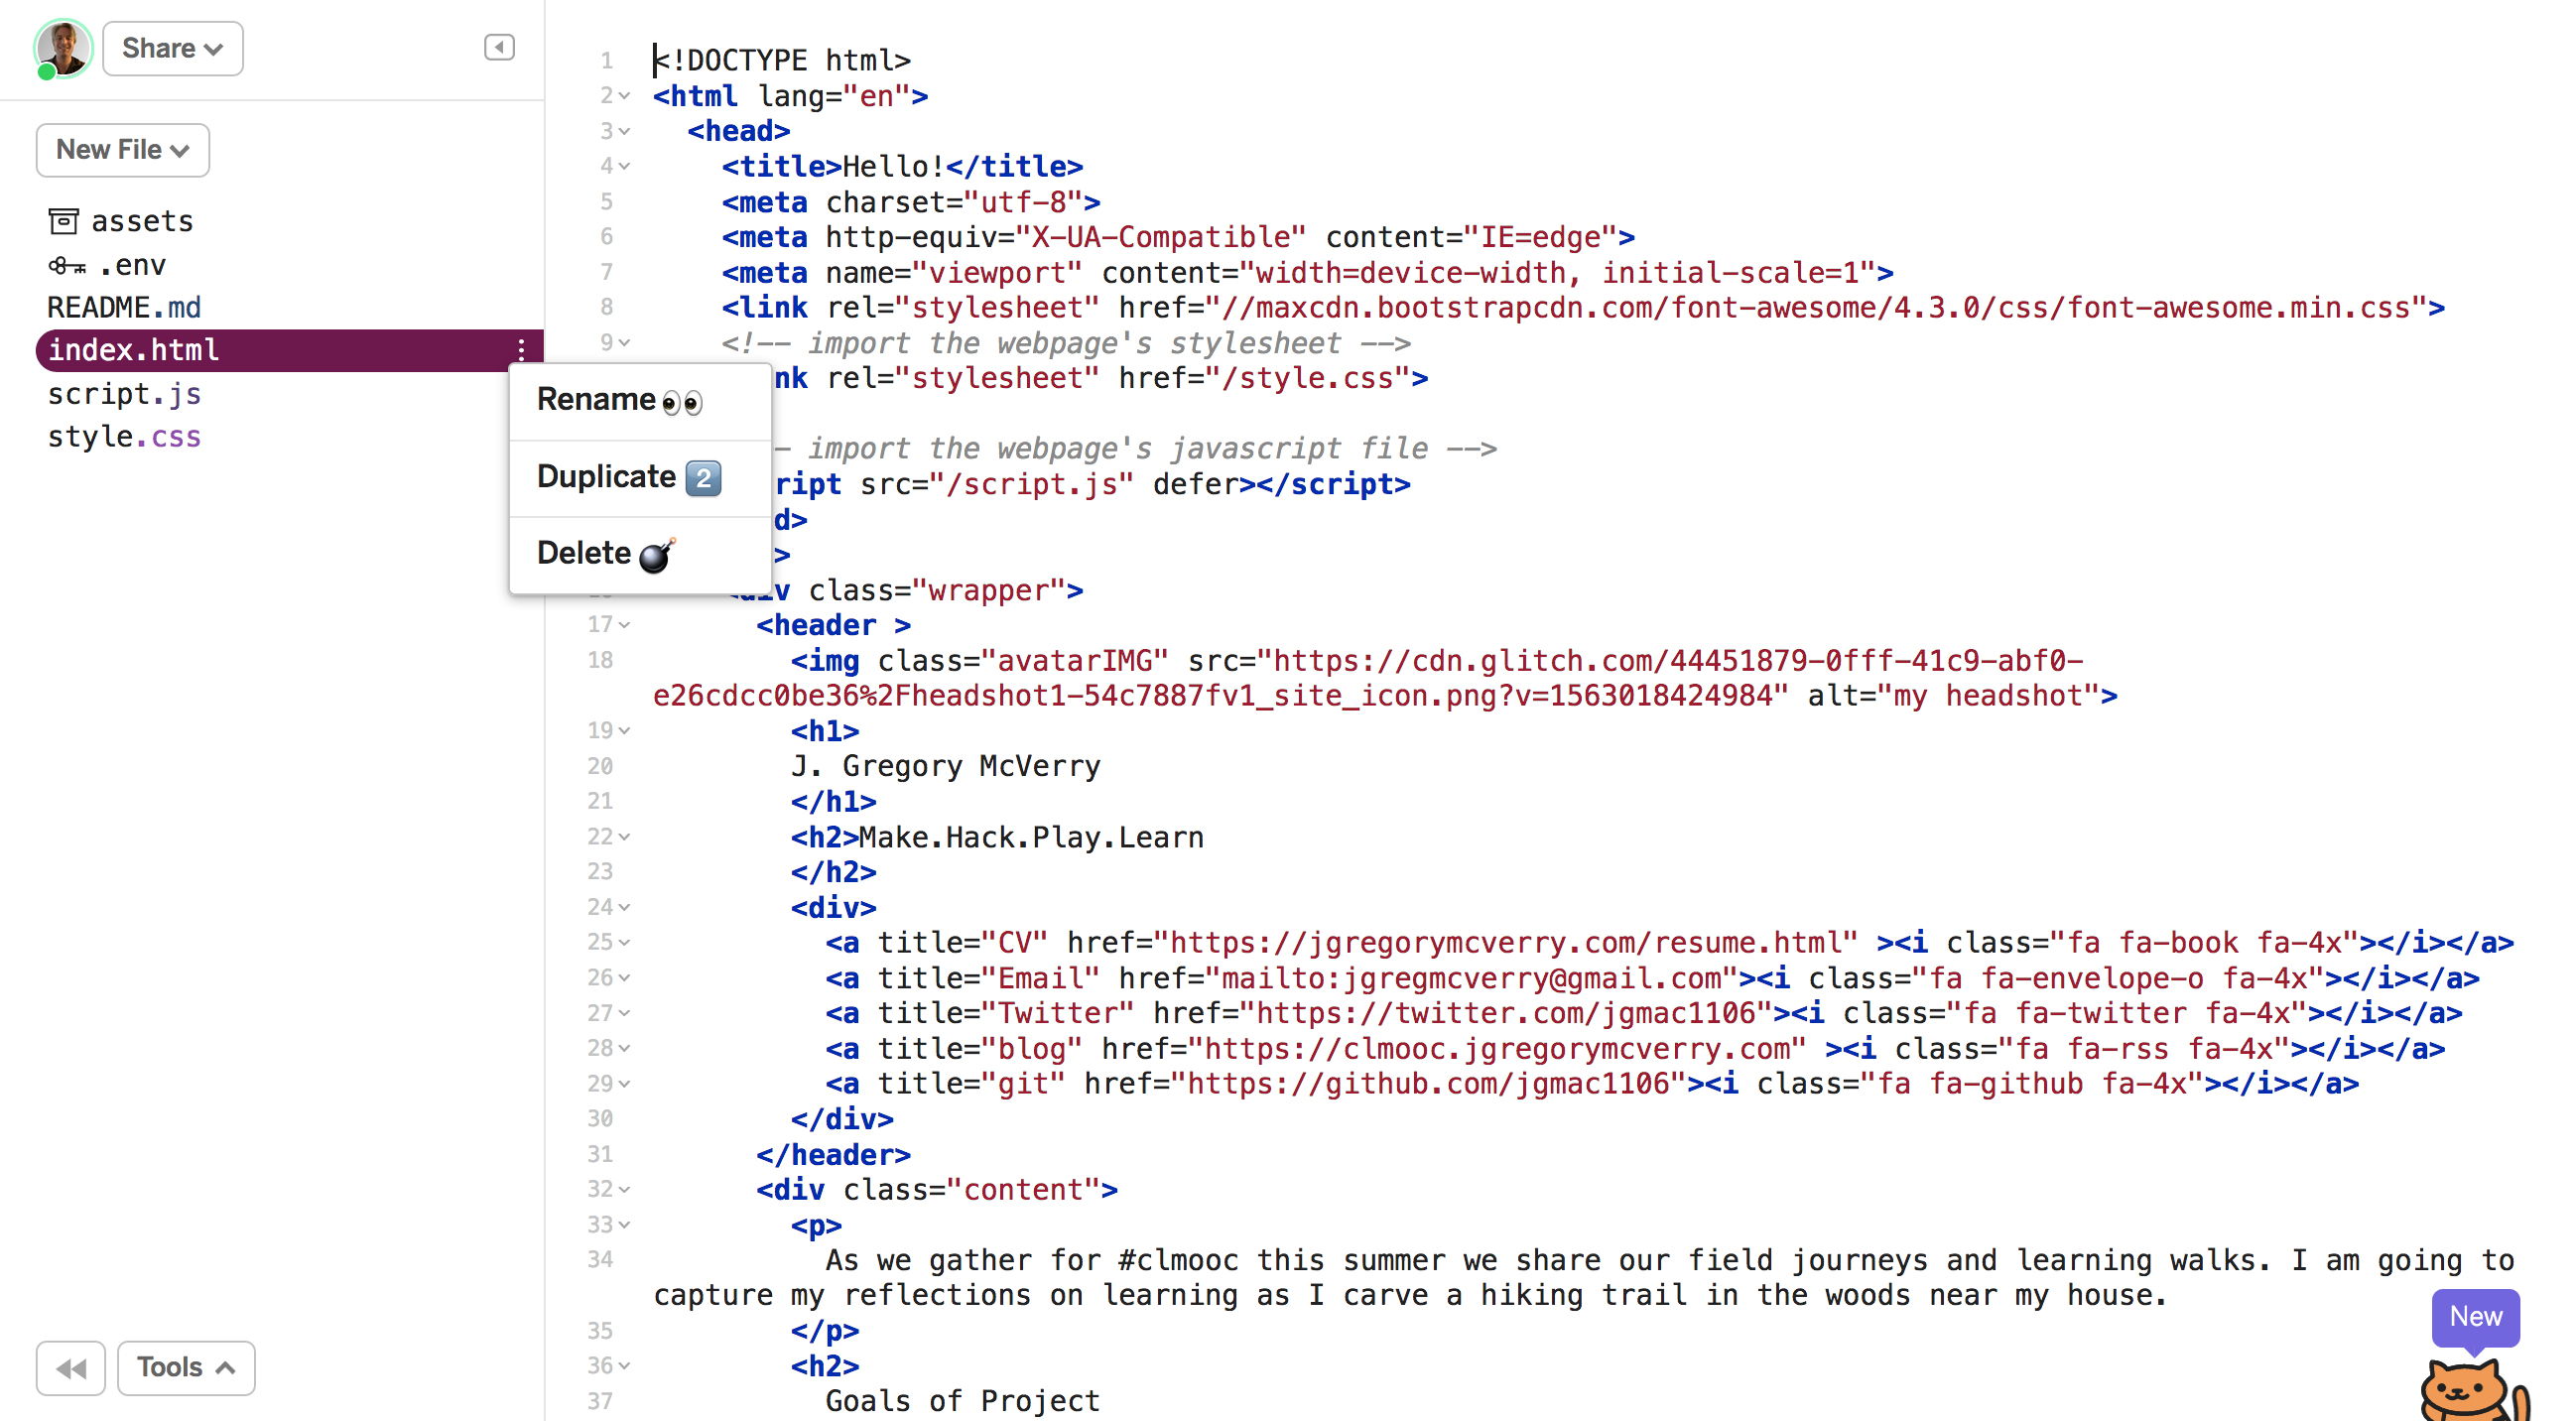 screenshot of duplicating file